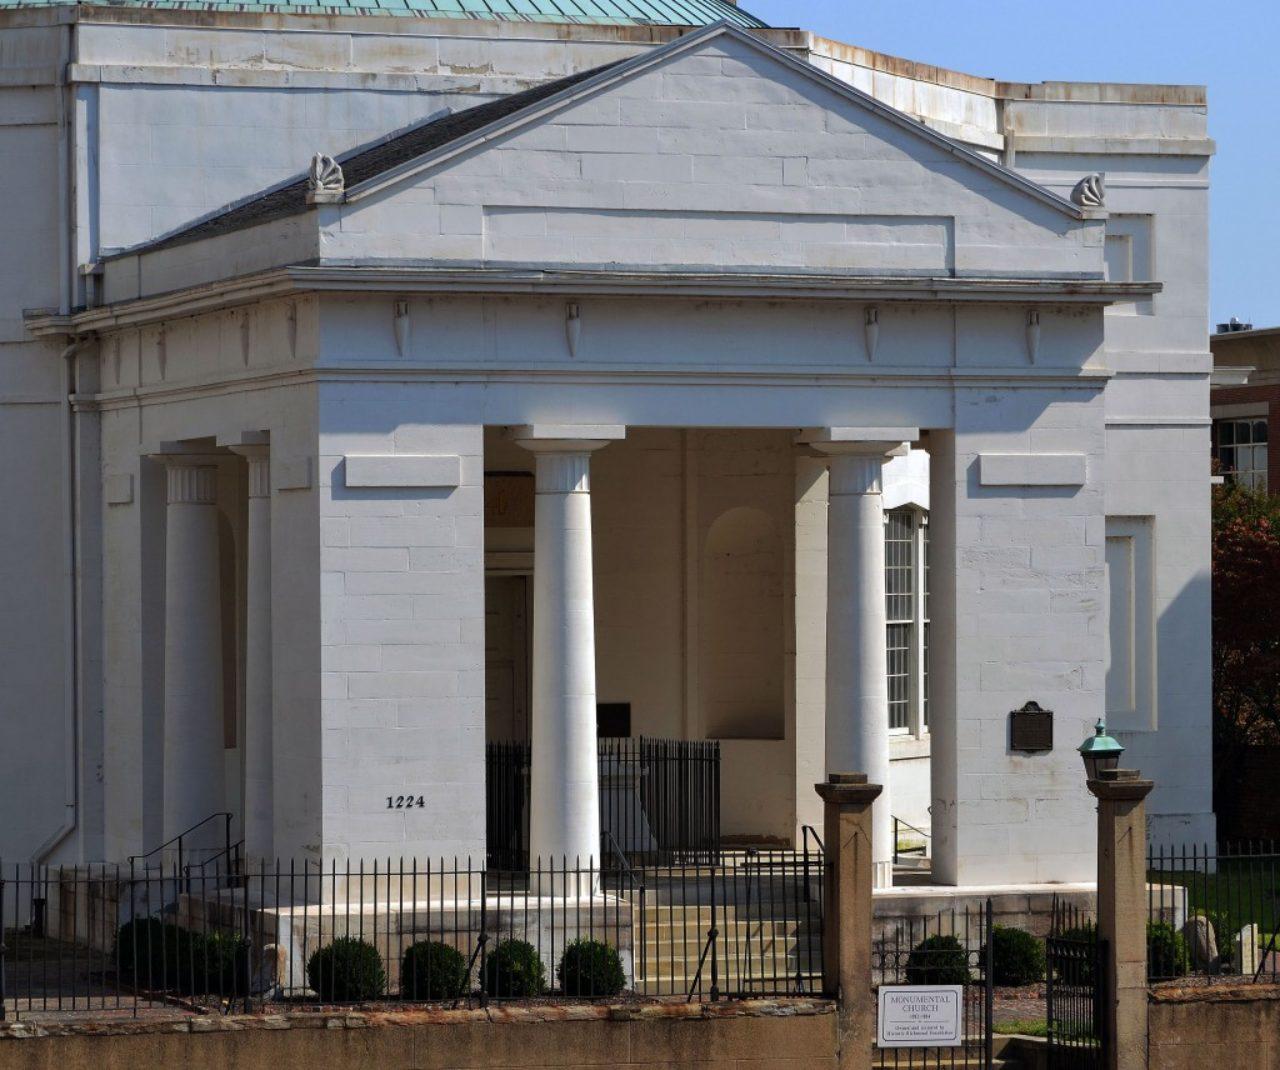 Figure 3. Monumental Church portico (Loth)